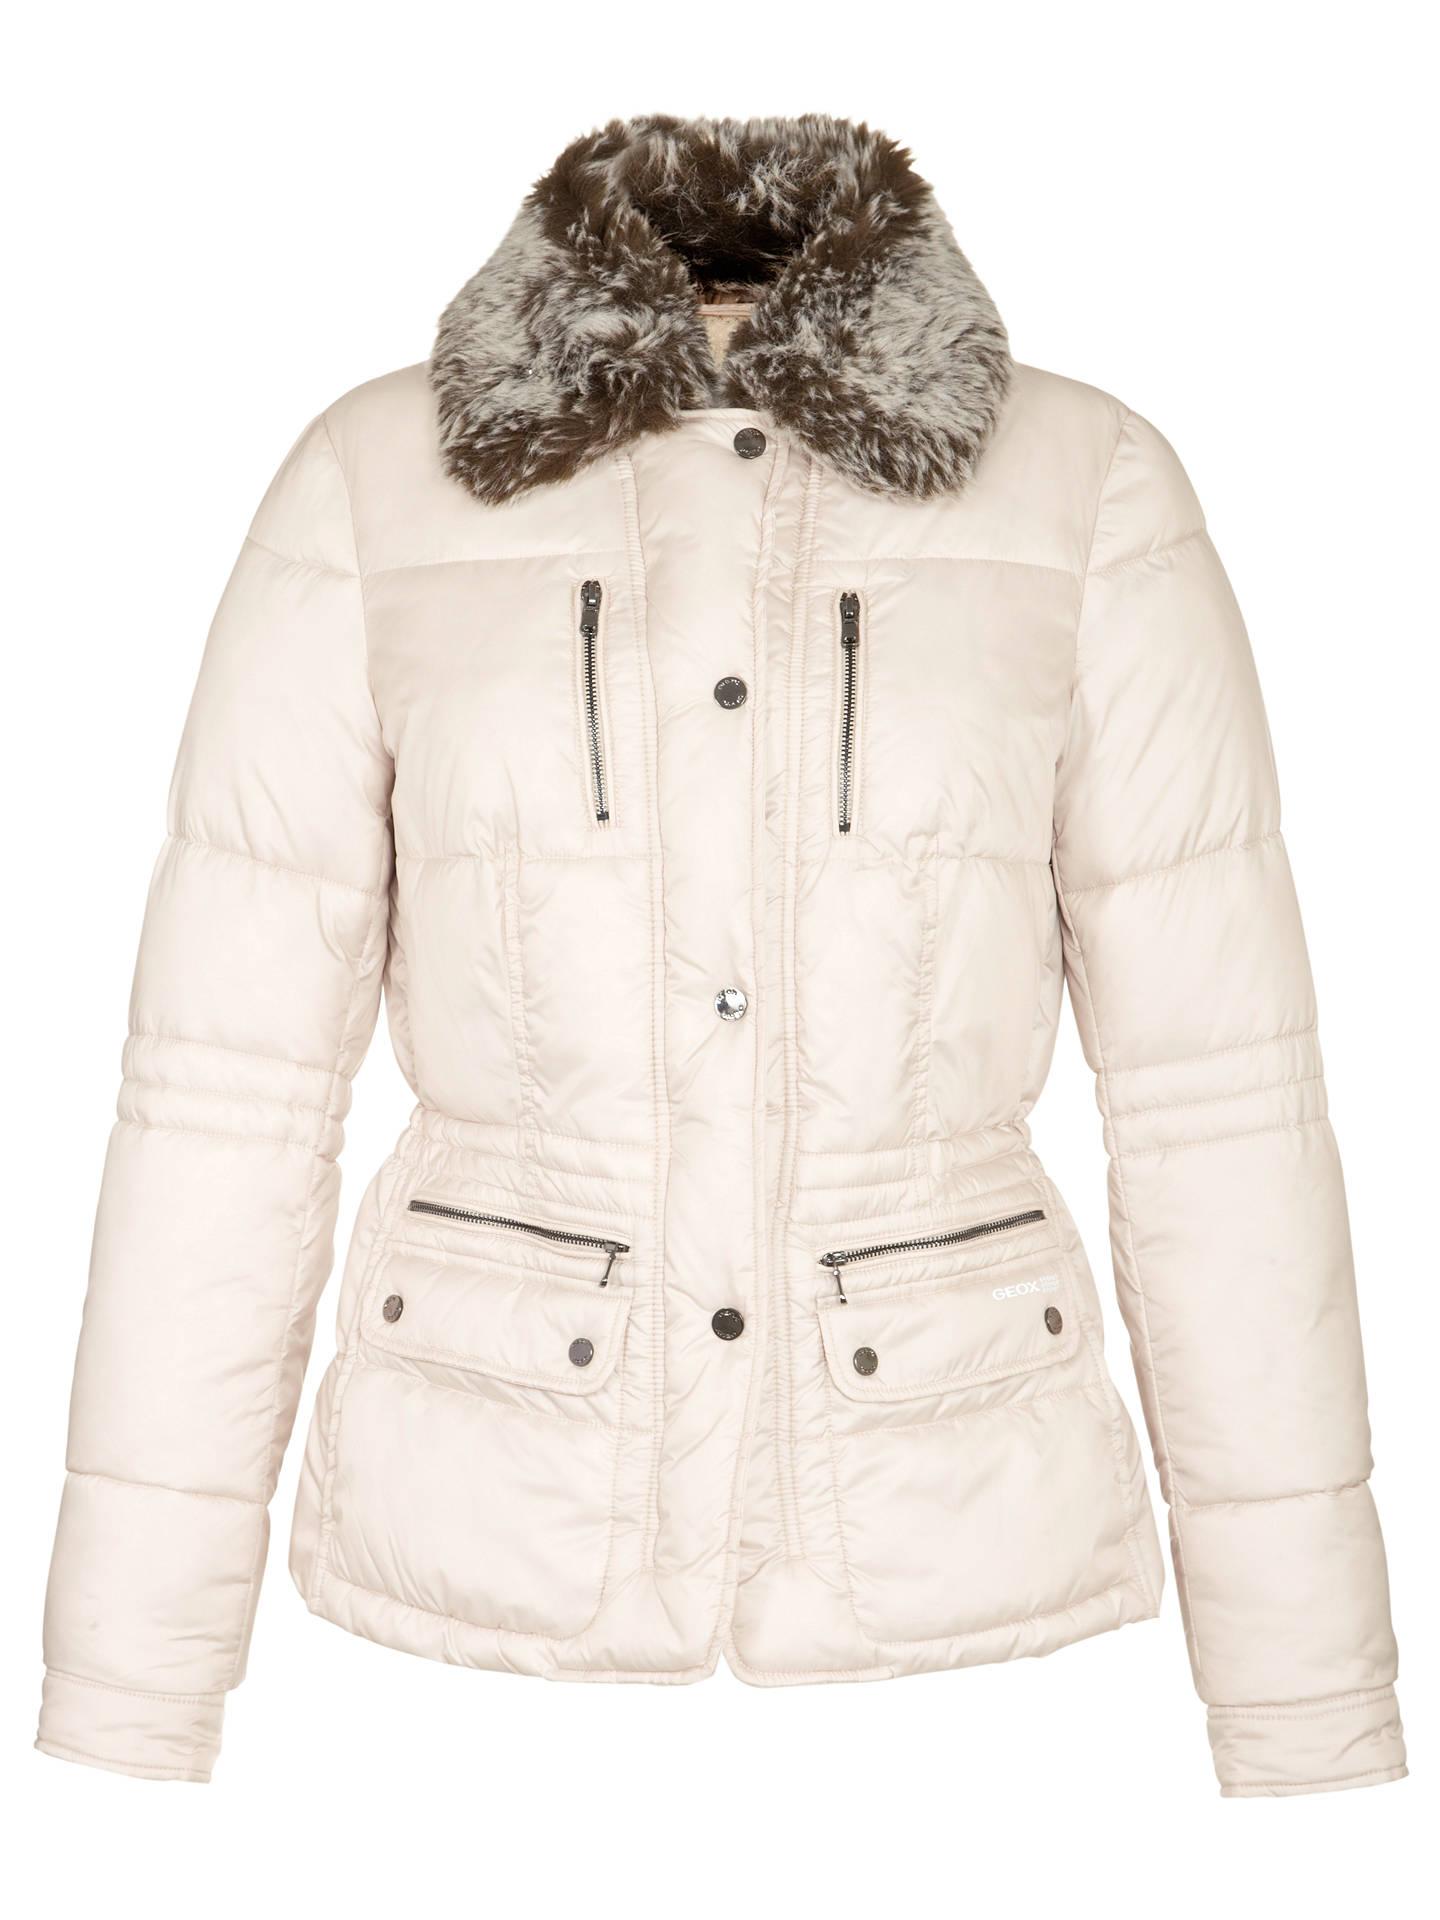 Chiedere informazioni accoppiatore se puoi  Geox Faux Fur Collar Short Jacket, Midnight Sand at John Lewis & Partners